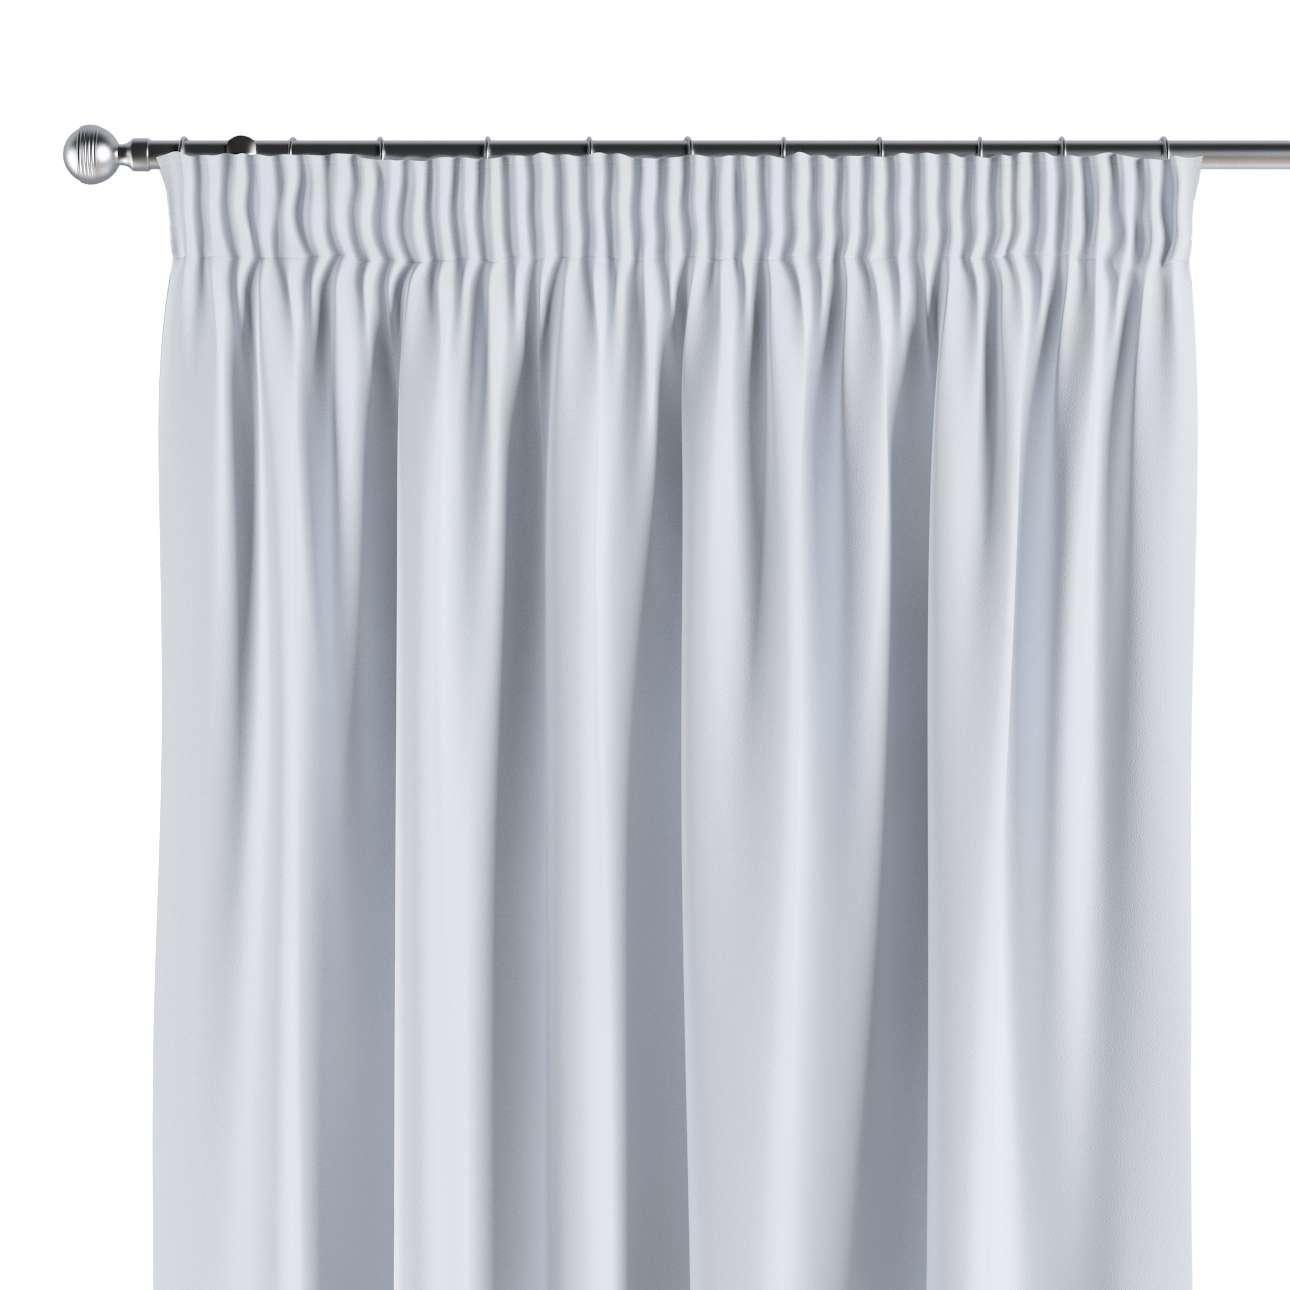 Blackout Pencil Pleat Curtains Off Whitepale Greyish Dekoria